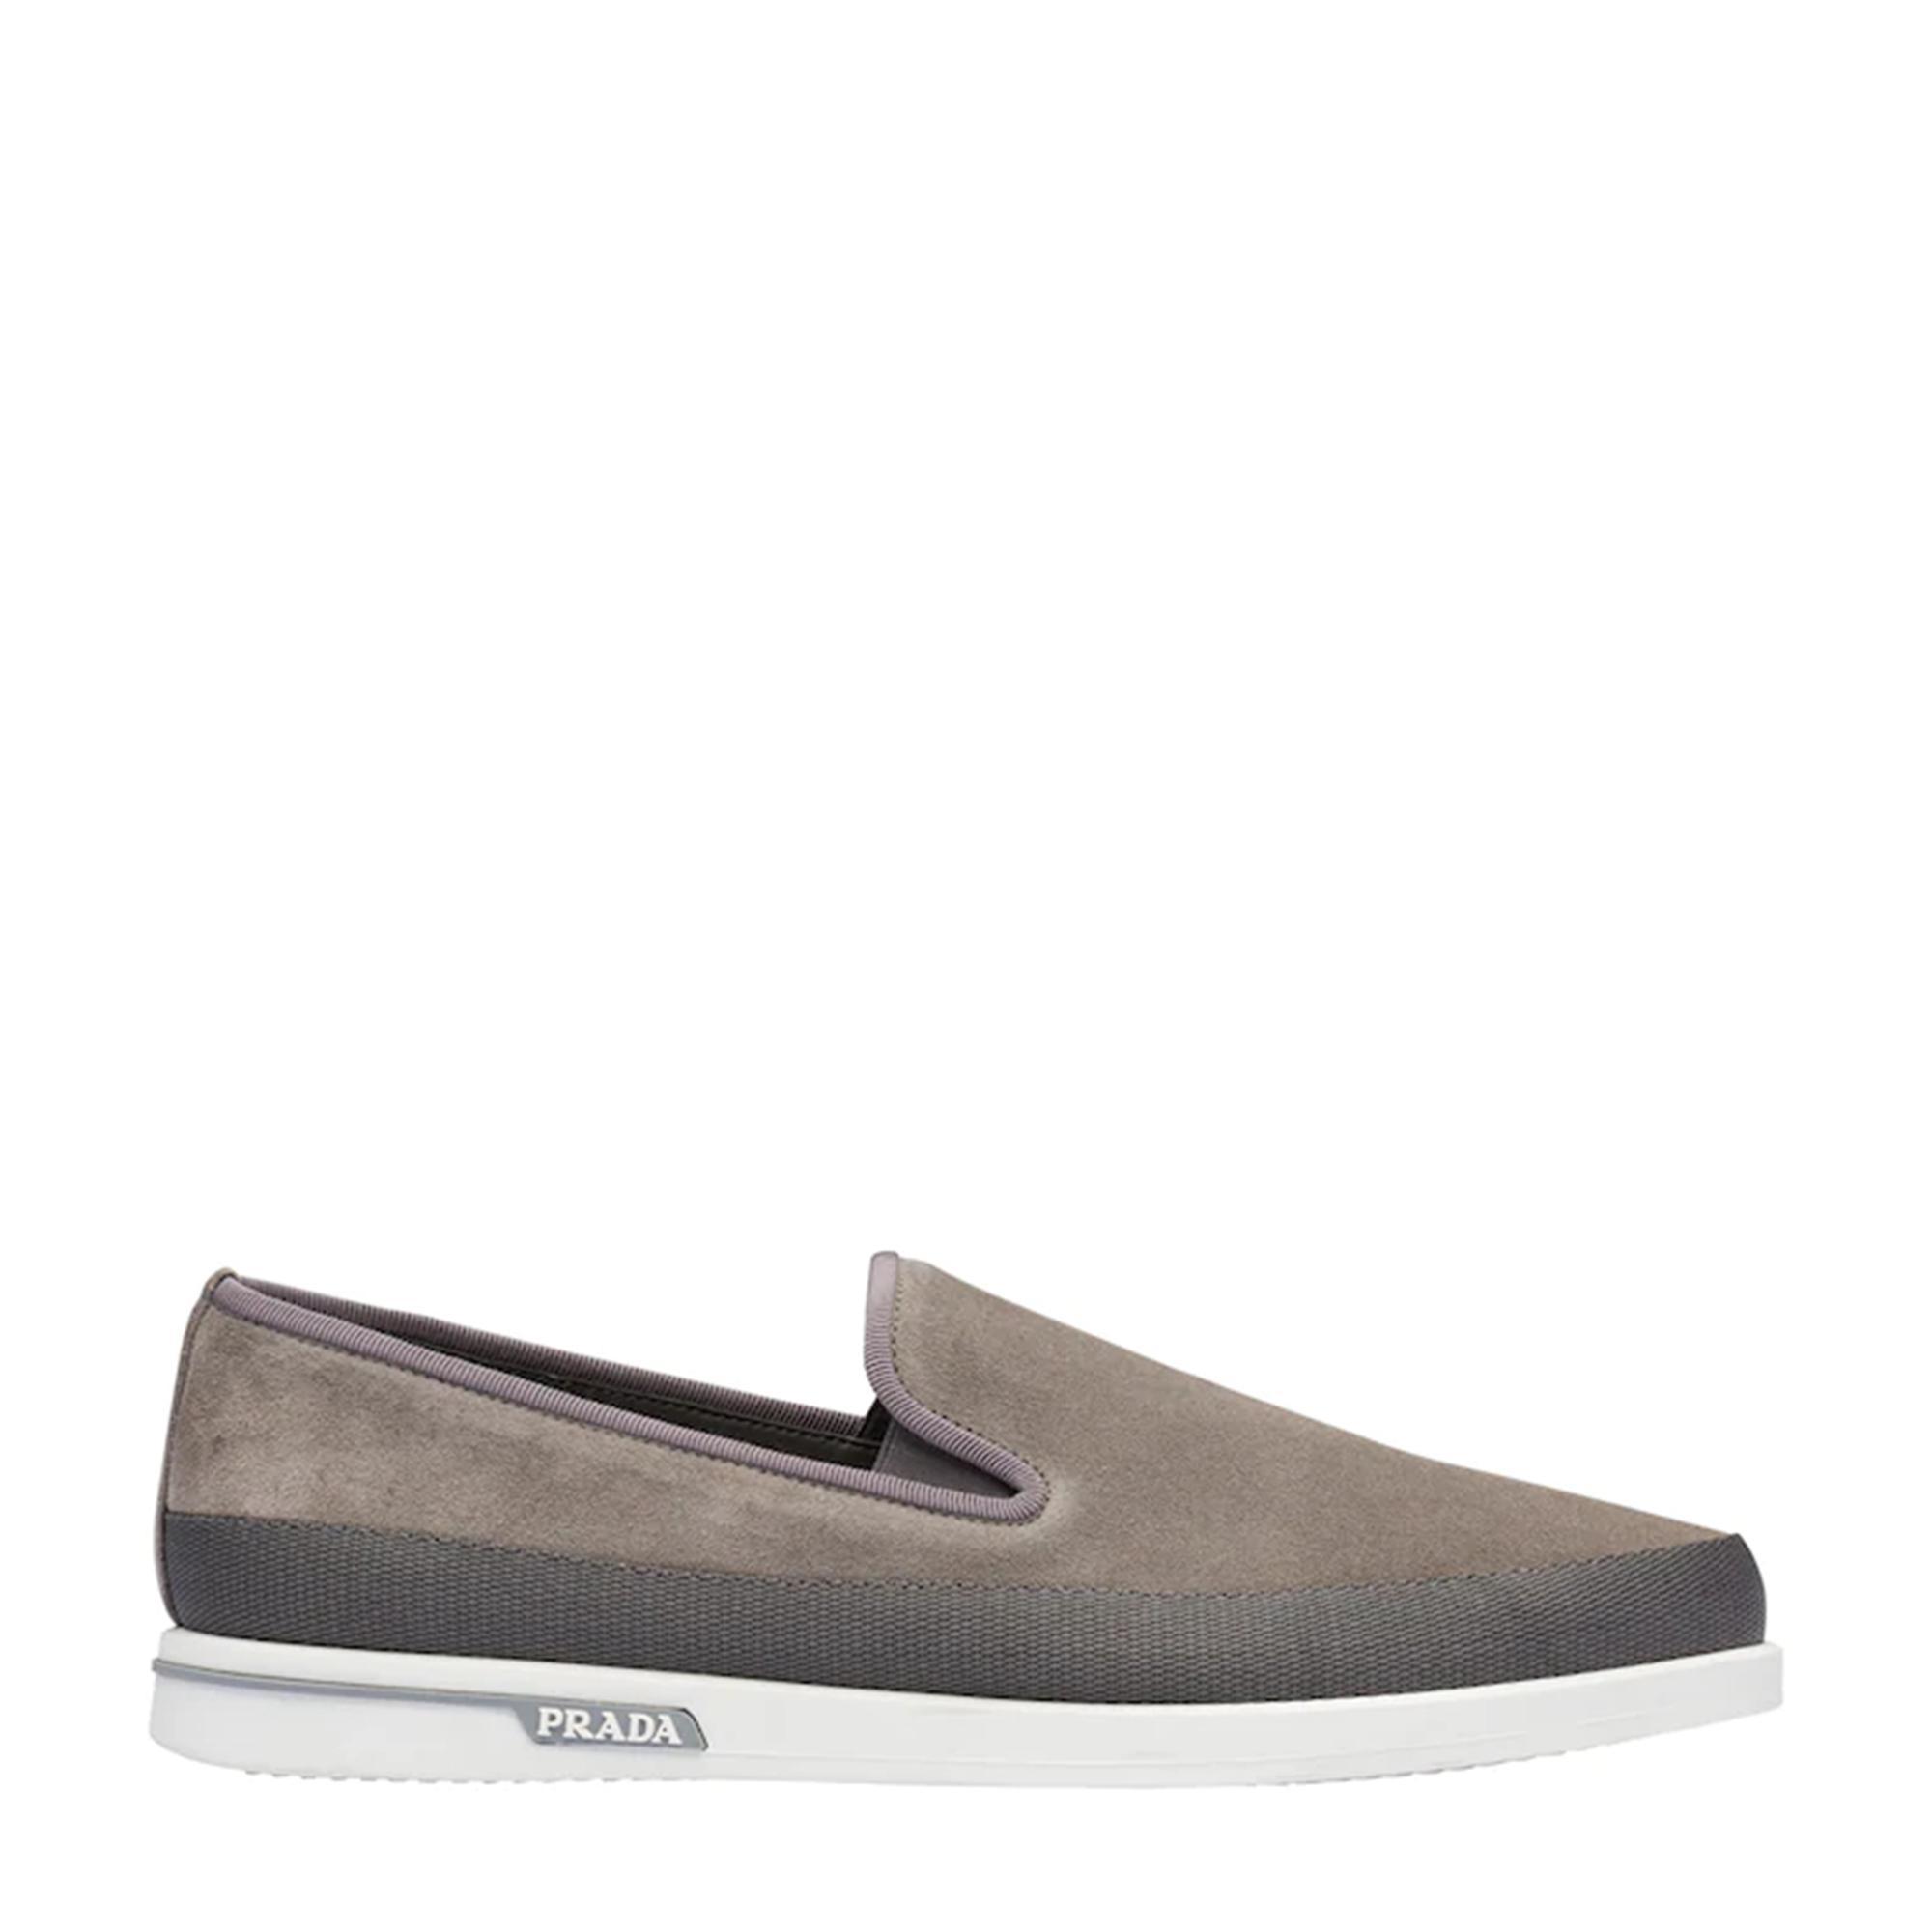 Saint Tropez slip-on sneakers